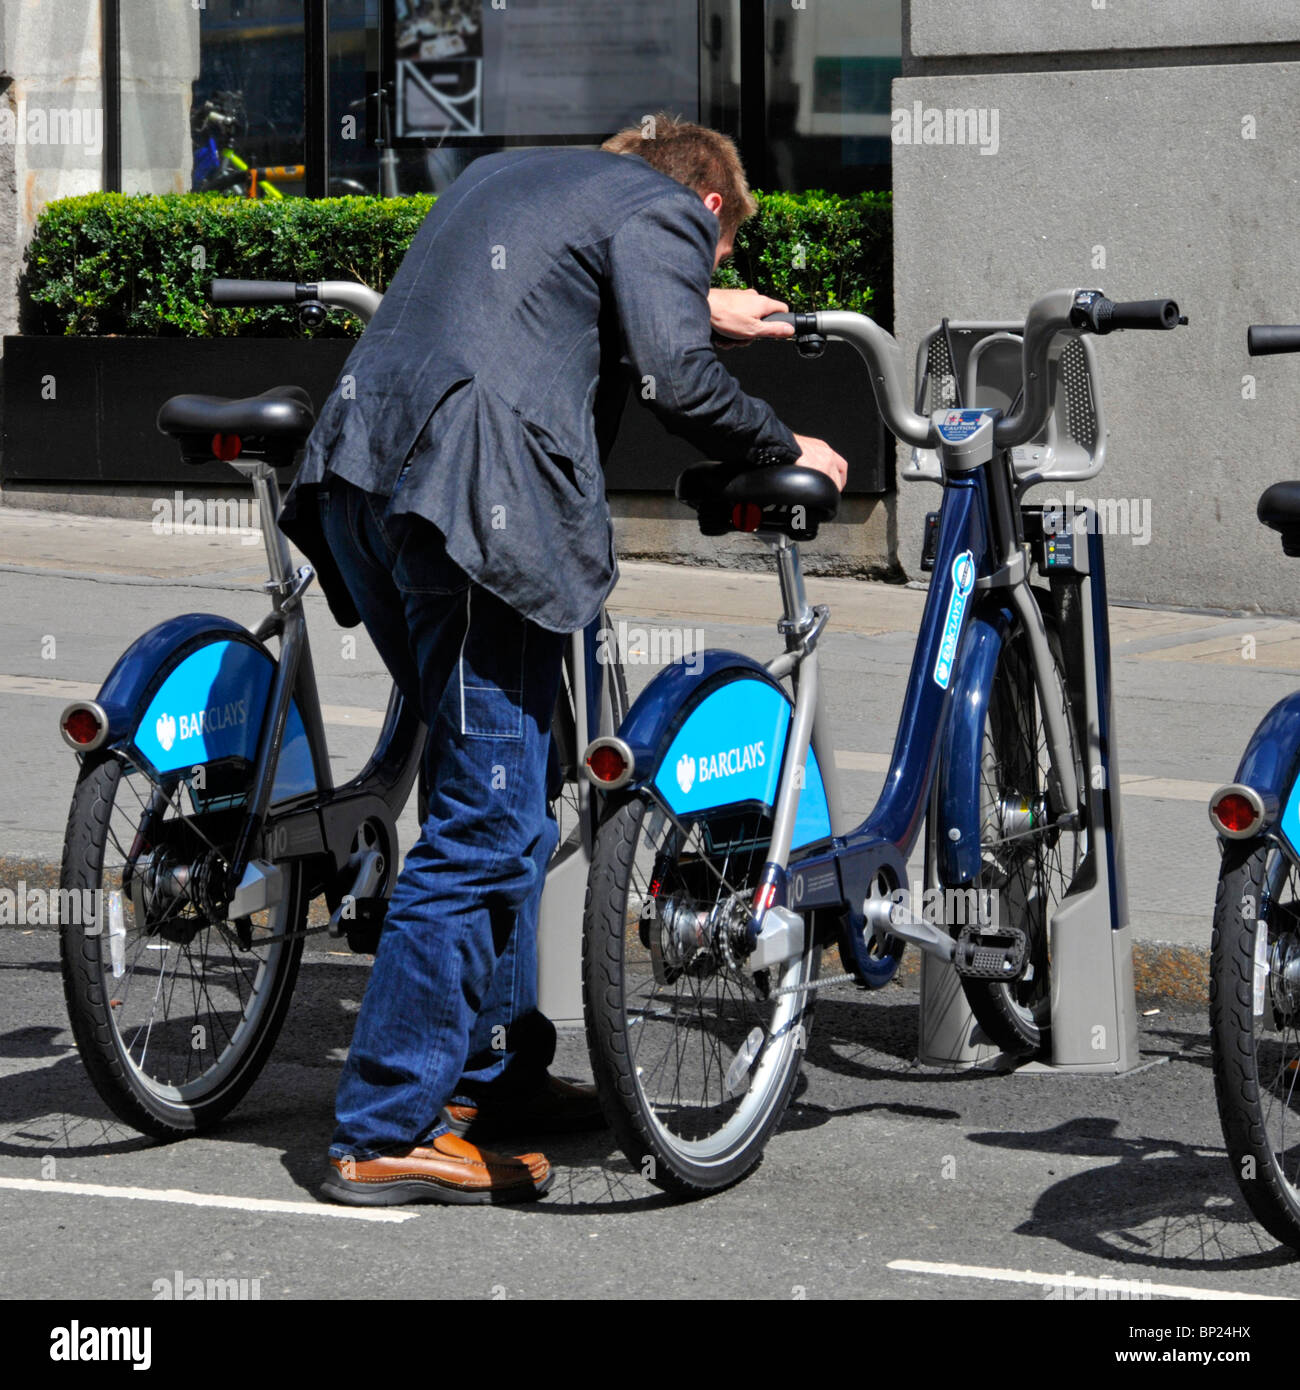 London user returning collecting hire bike - Stock Image